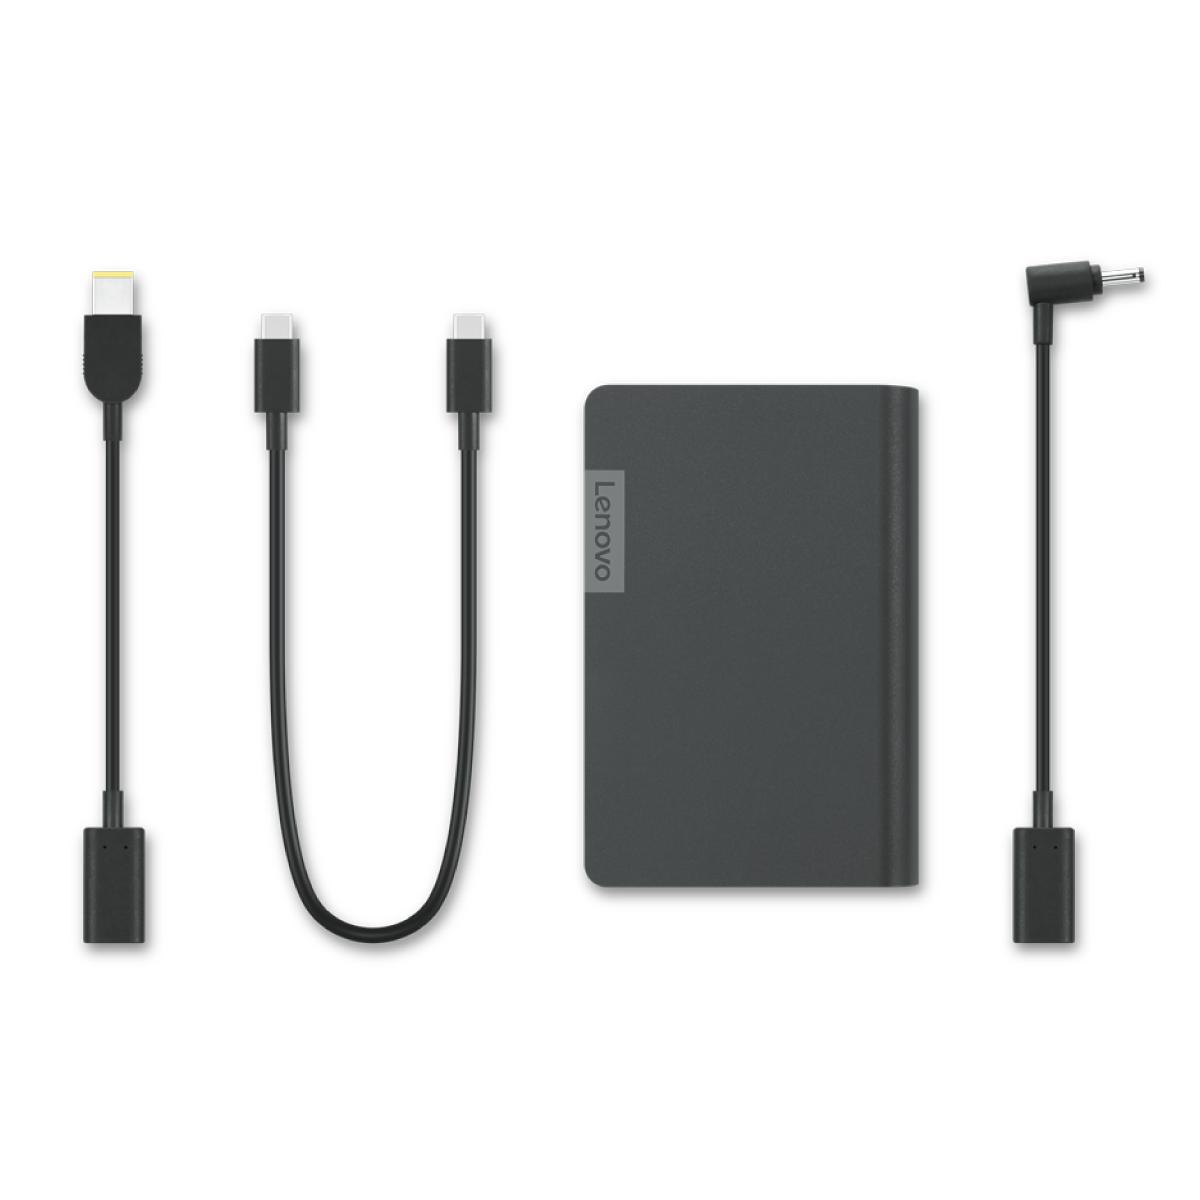 Lenovo USB Type-C Laptop Power Bank 14000 mAh